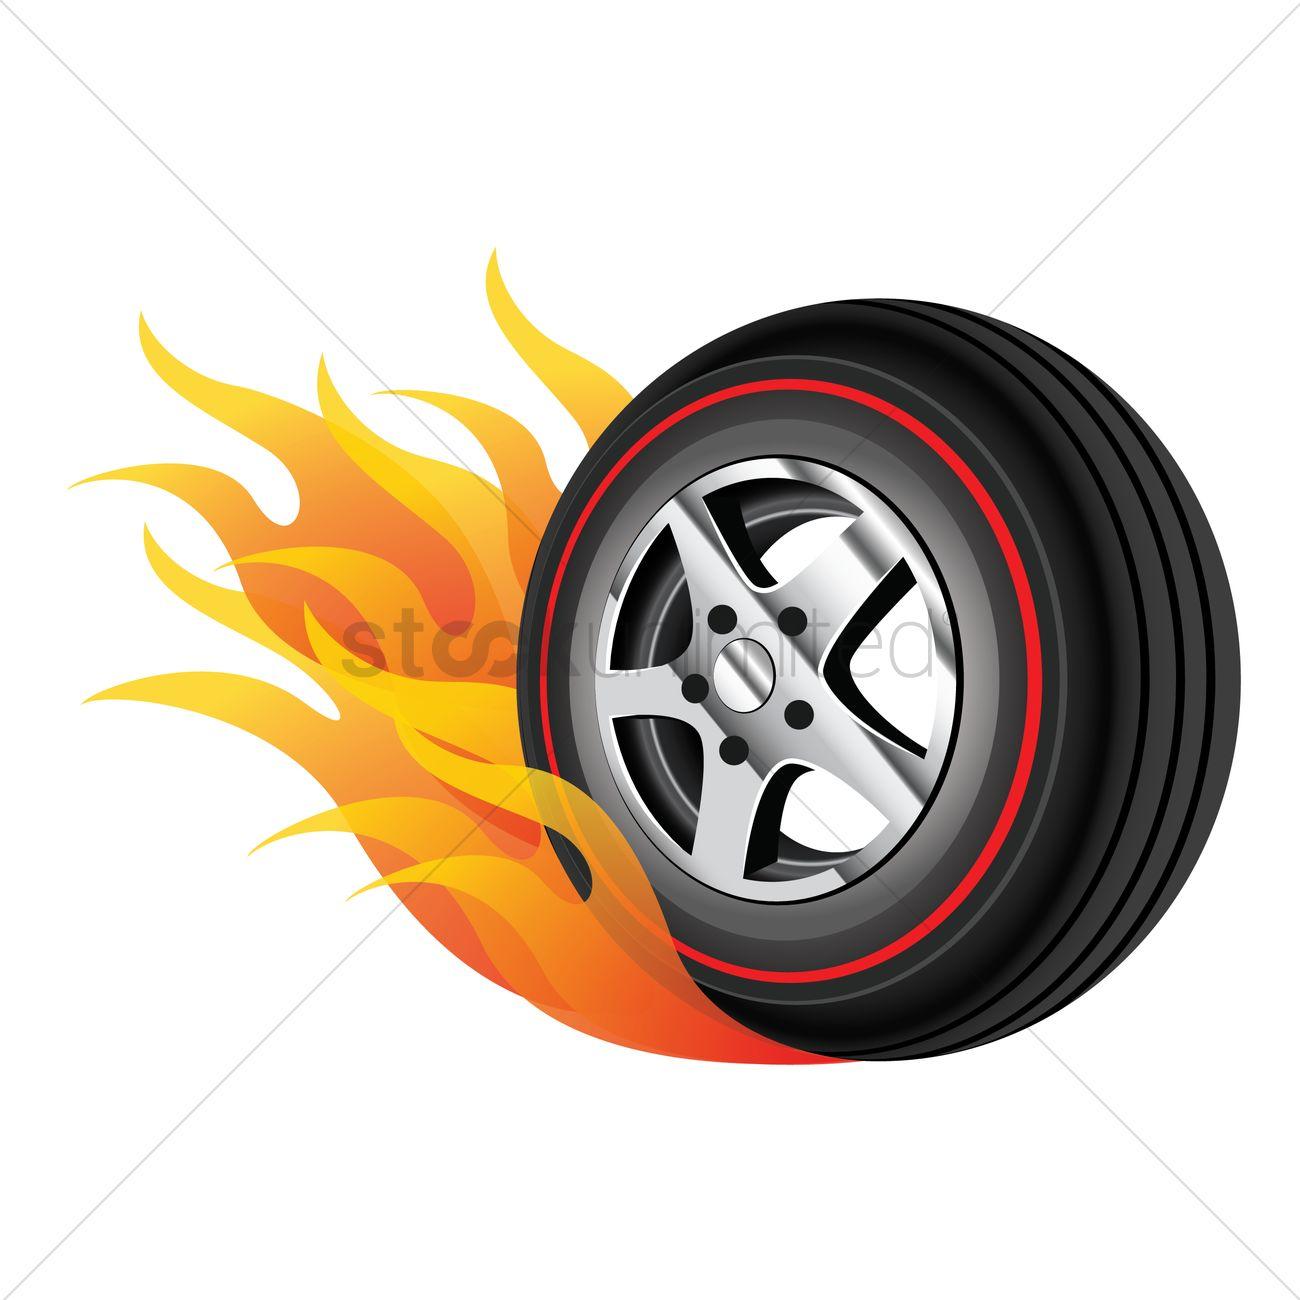 SEC Power Poll Week 6: Tire Fire Edition - Roll 'Bama Roll |Flamming Tire